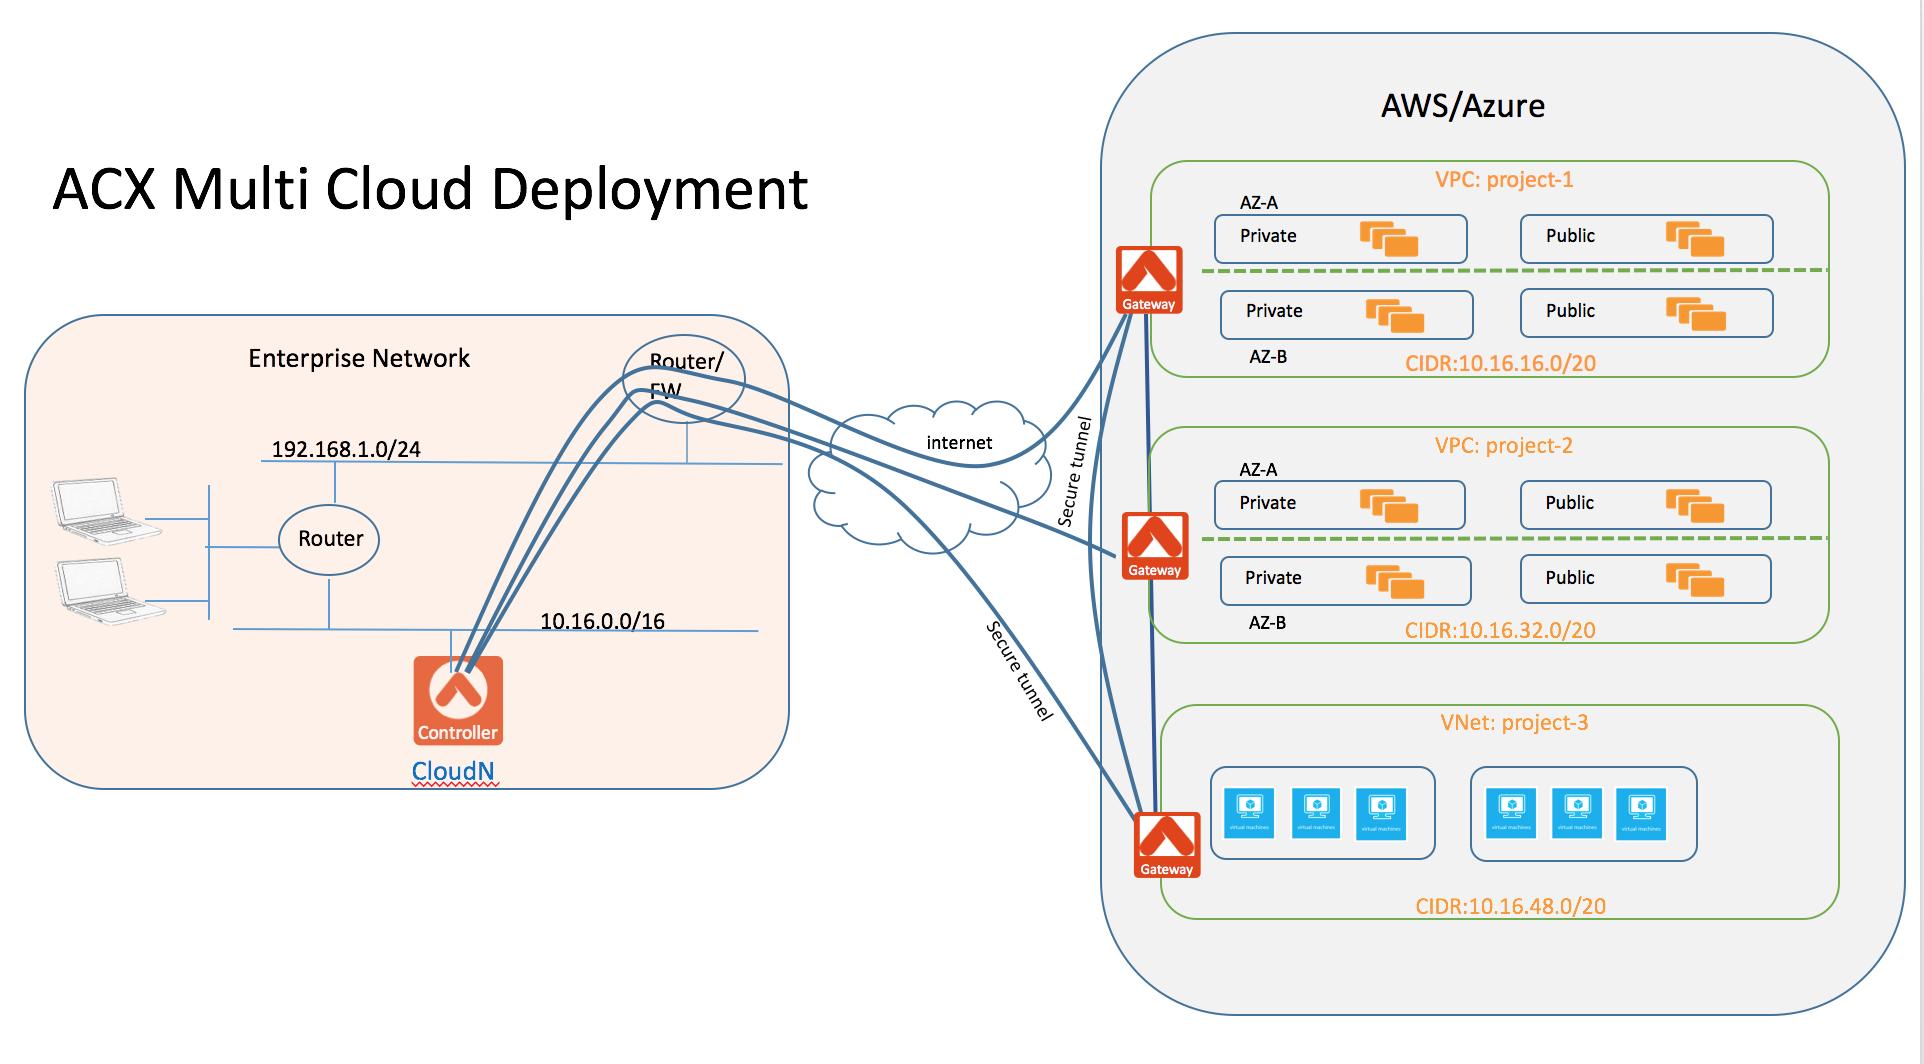 Aws Ec2 Pricing Spreadsheet With Regard To Extending Your Vmware Workloads To Public Cloud — Aviatrixdocs